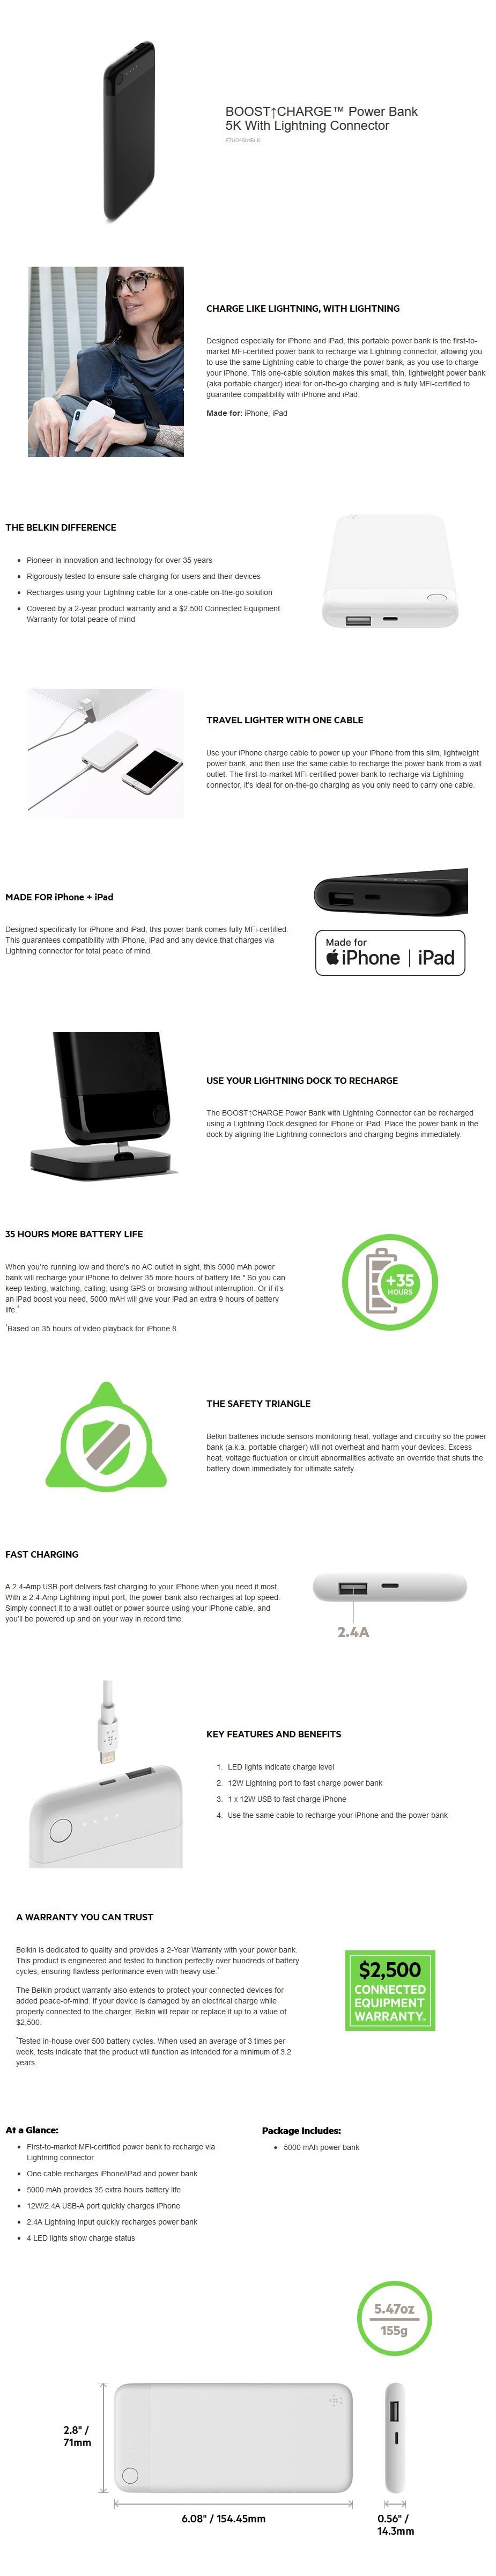 Belkin Boost Charge 5K Power Bank with Lightning Connector - Black - Desktop Overview 1